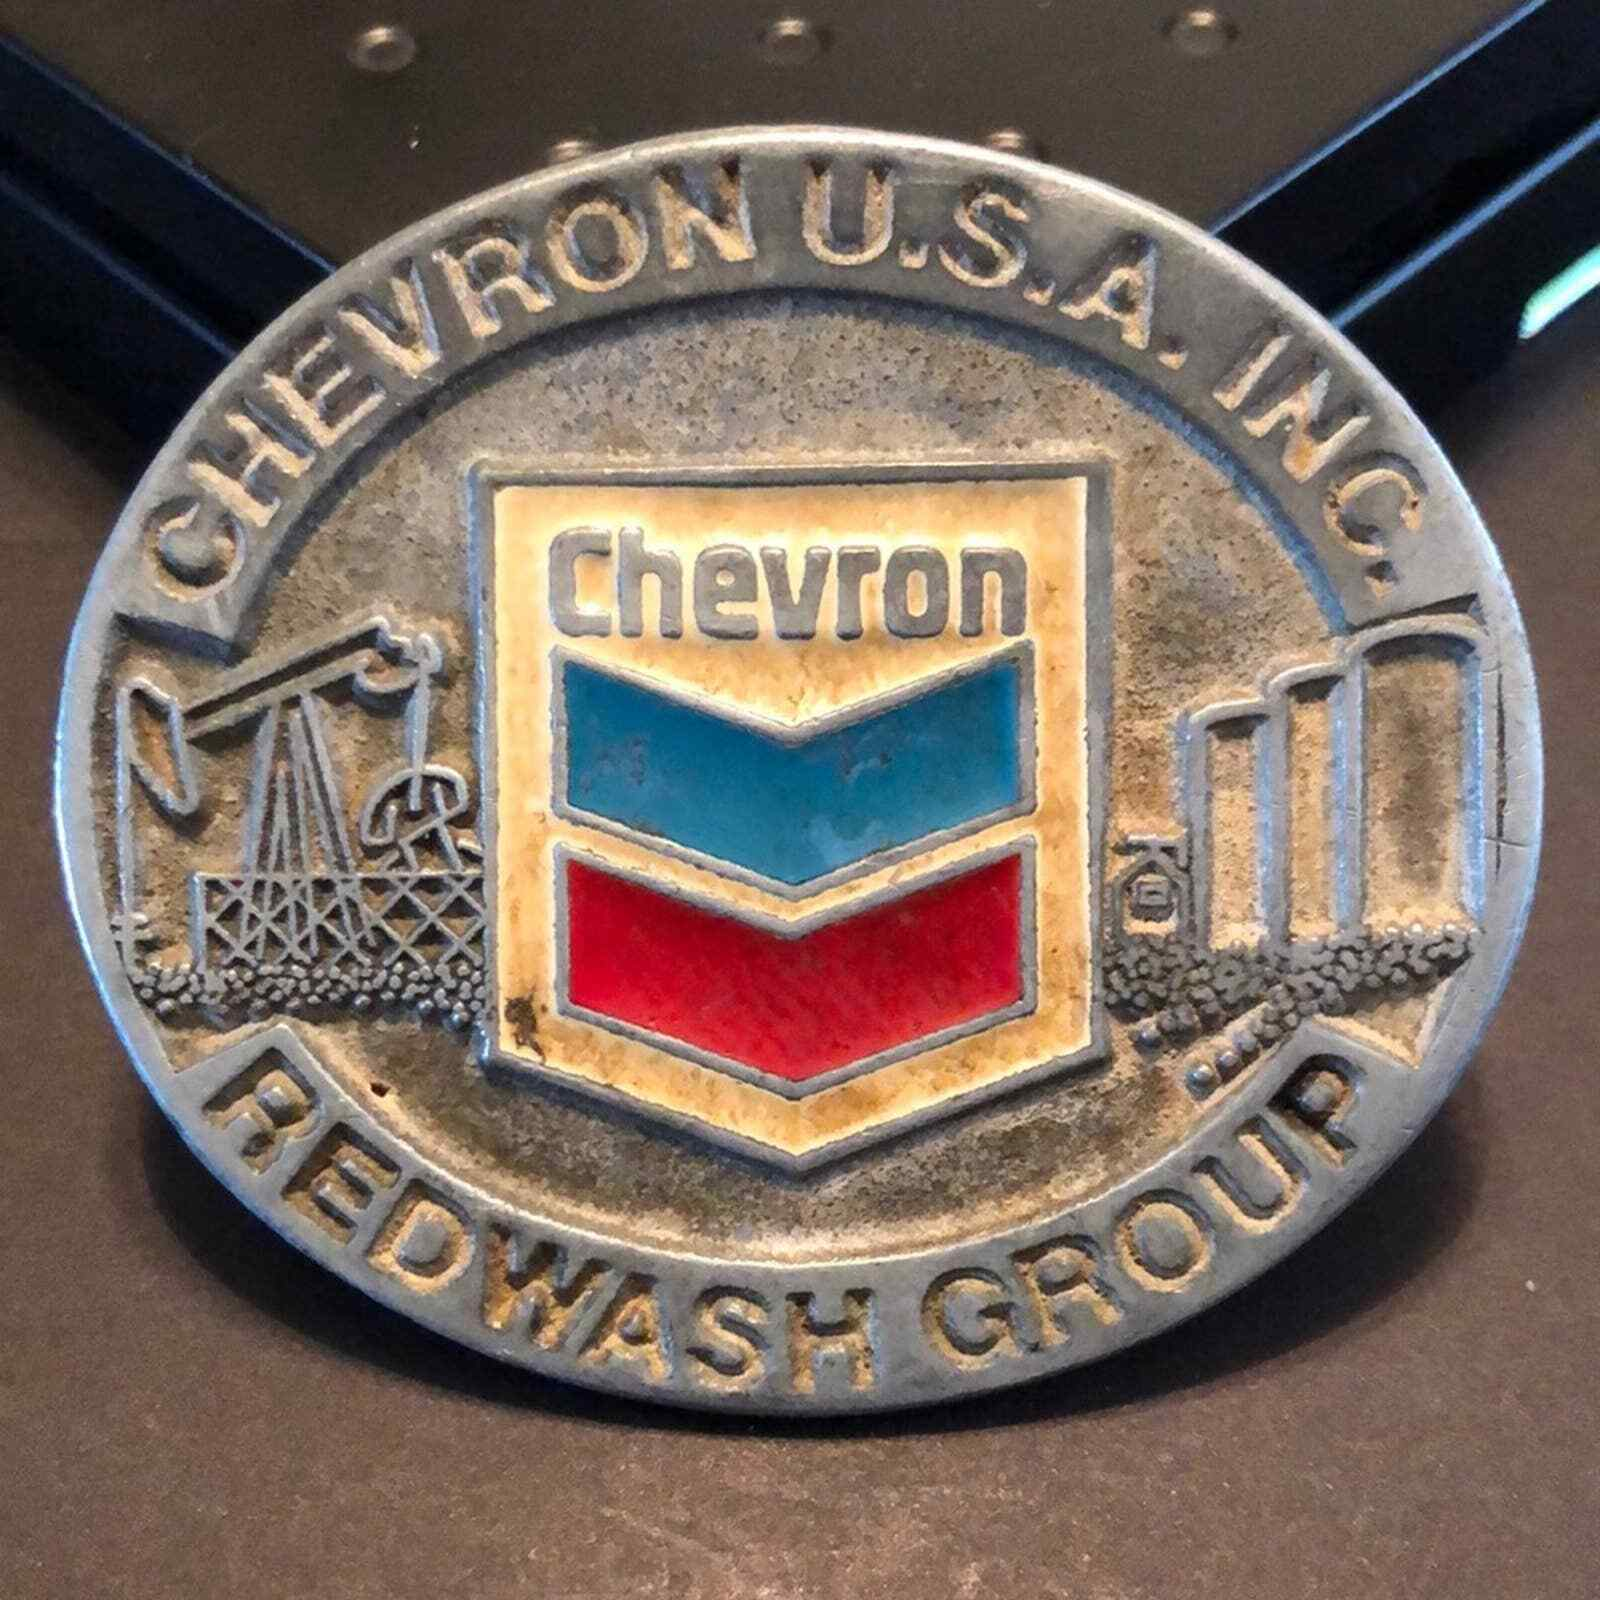 Rare Vintage VTG Chevron USA Oil Redwash Group Belt Buckle